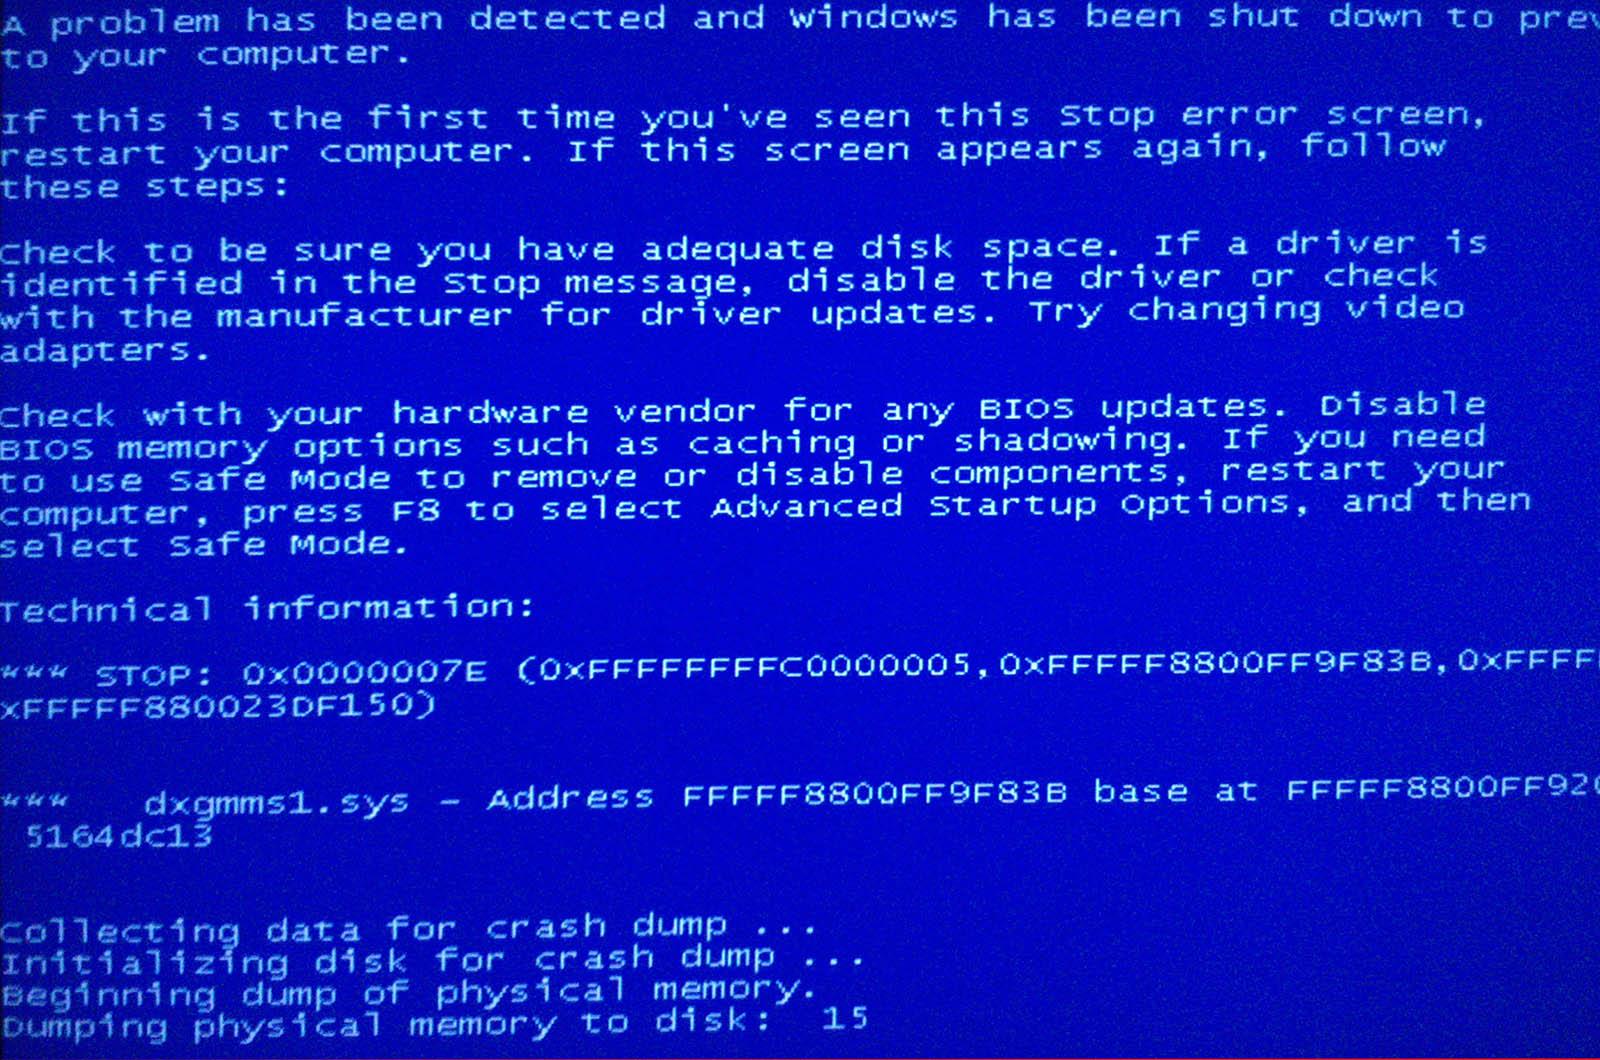 solucion pantallazo azul mientras juego dxgmms1.sys